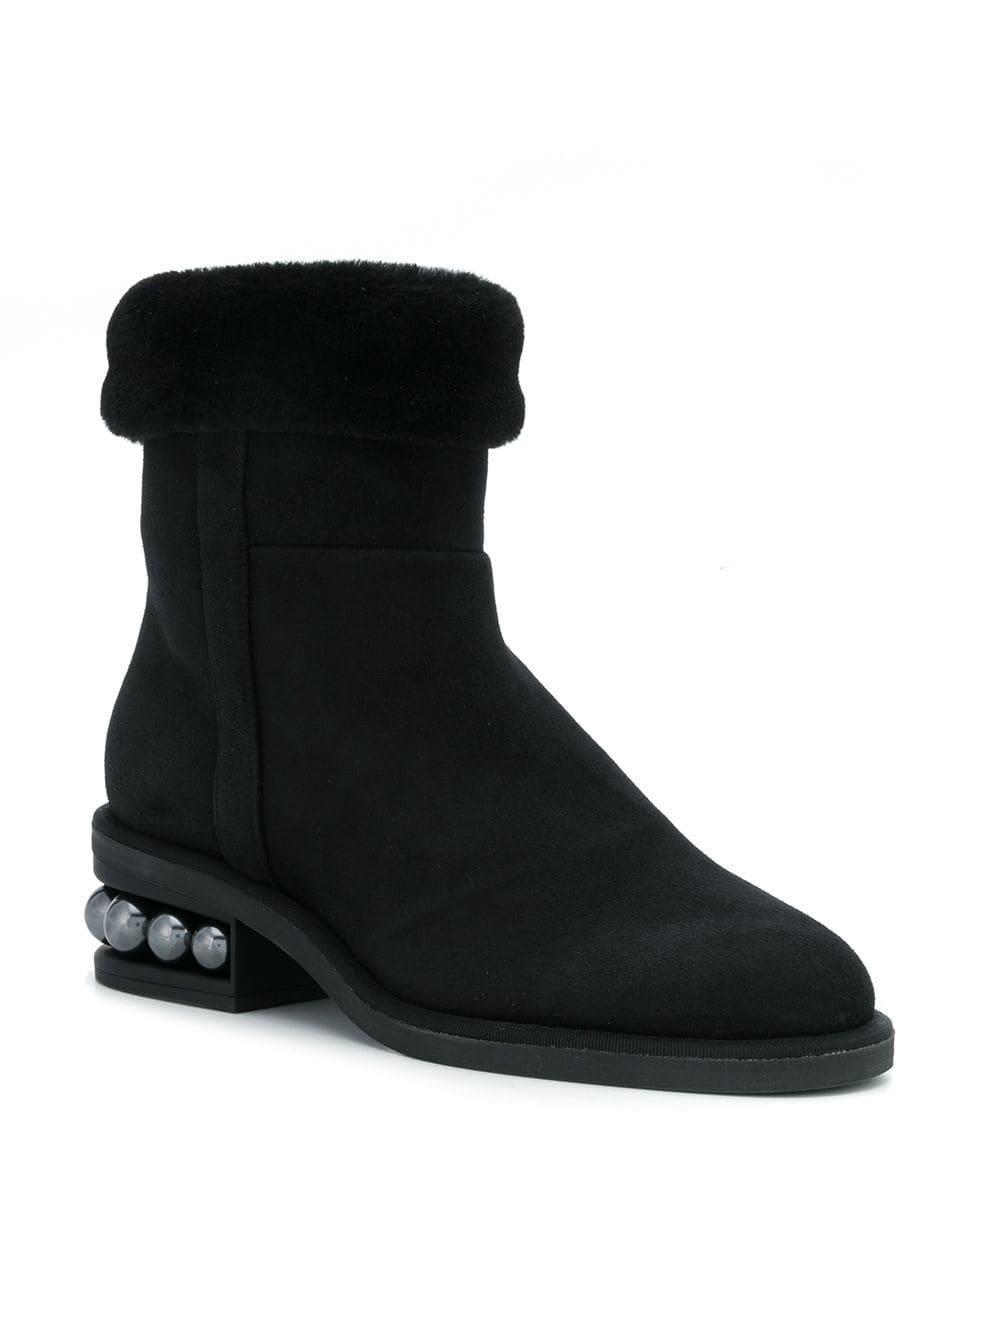 Slip Boots Nicholas On Lyst Black Kirkwood In Casati Pearl YFcdcIw7q